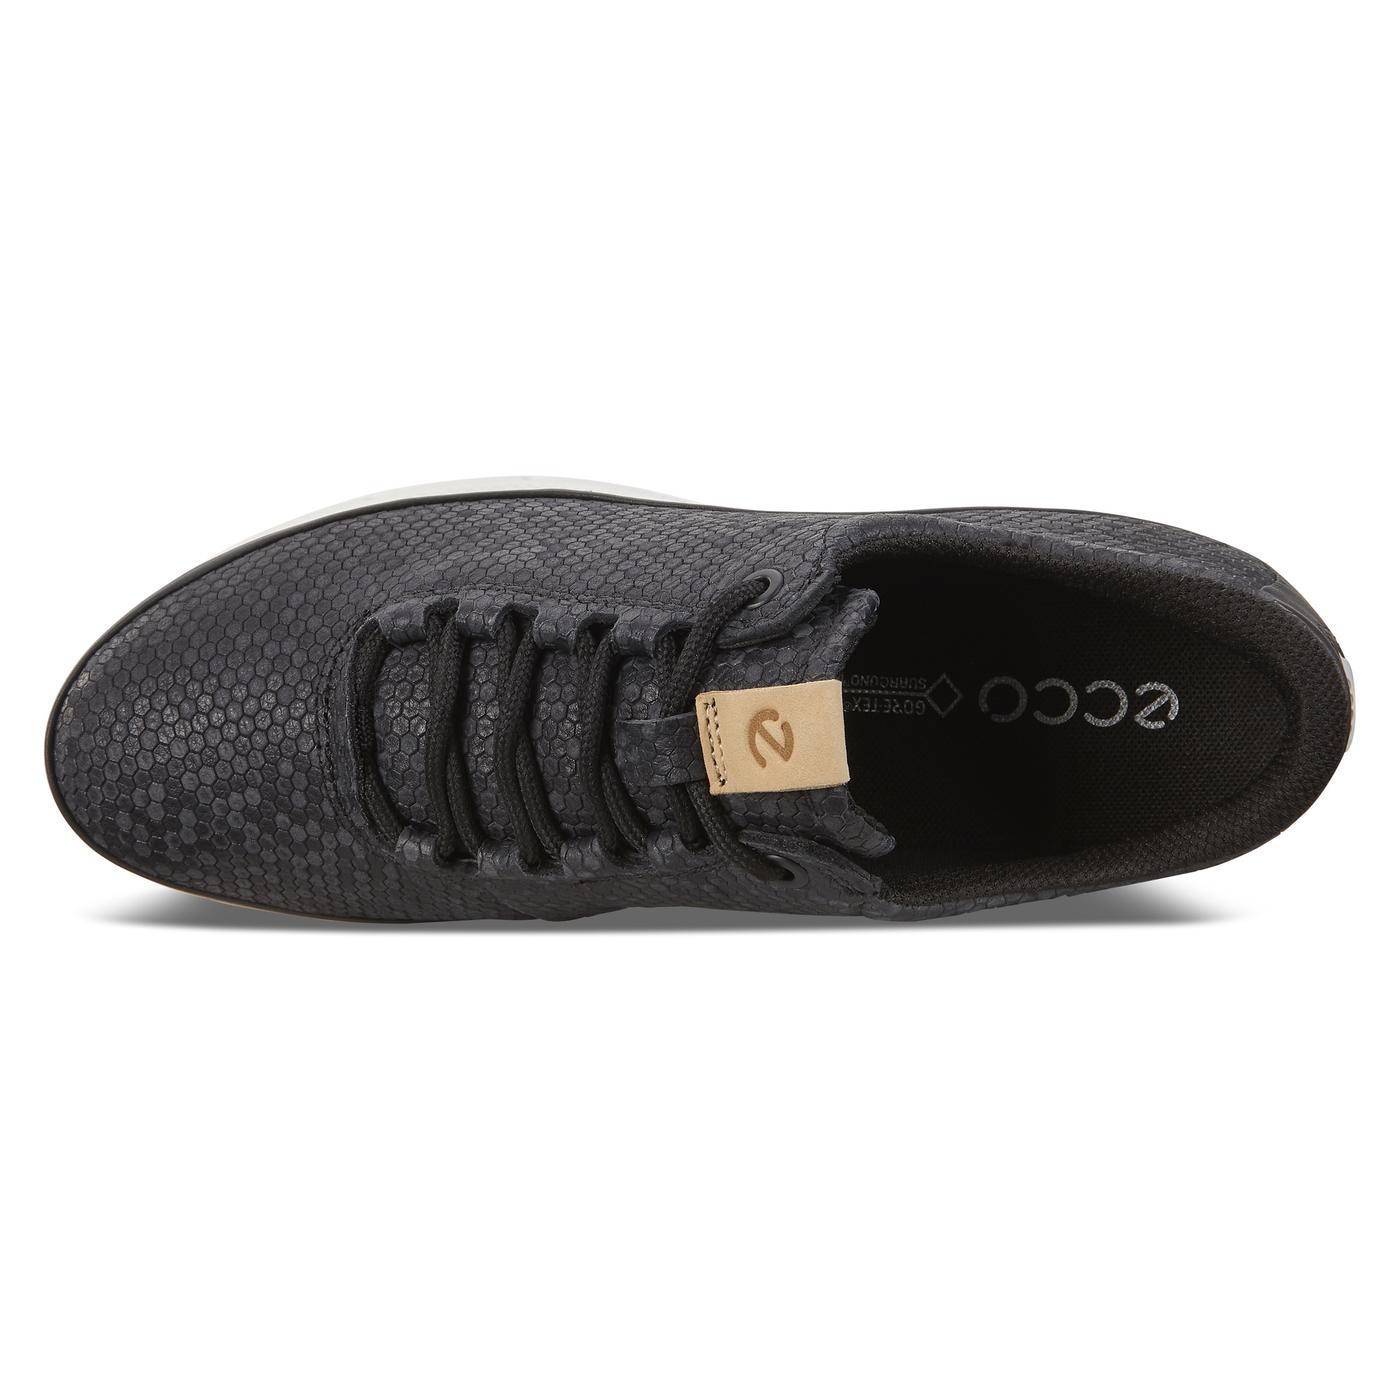 ECCO COOL GTX Women's Sneaker